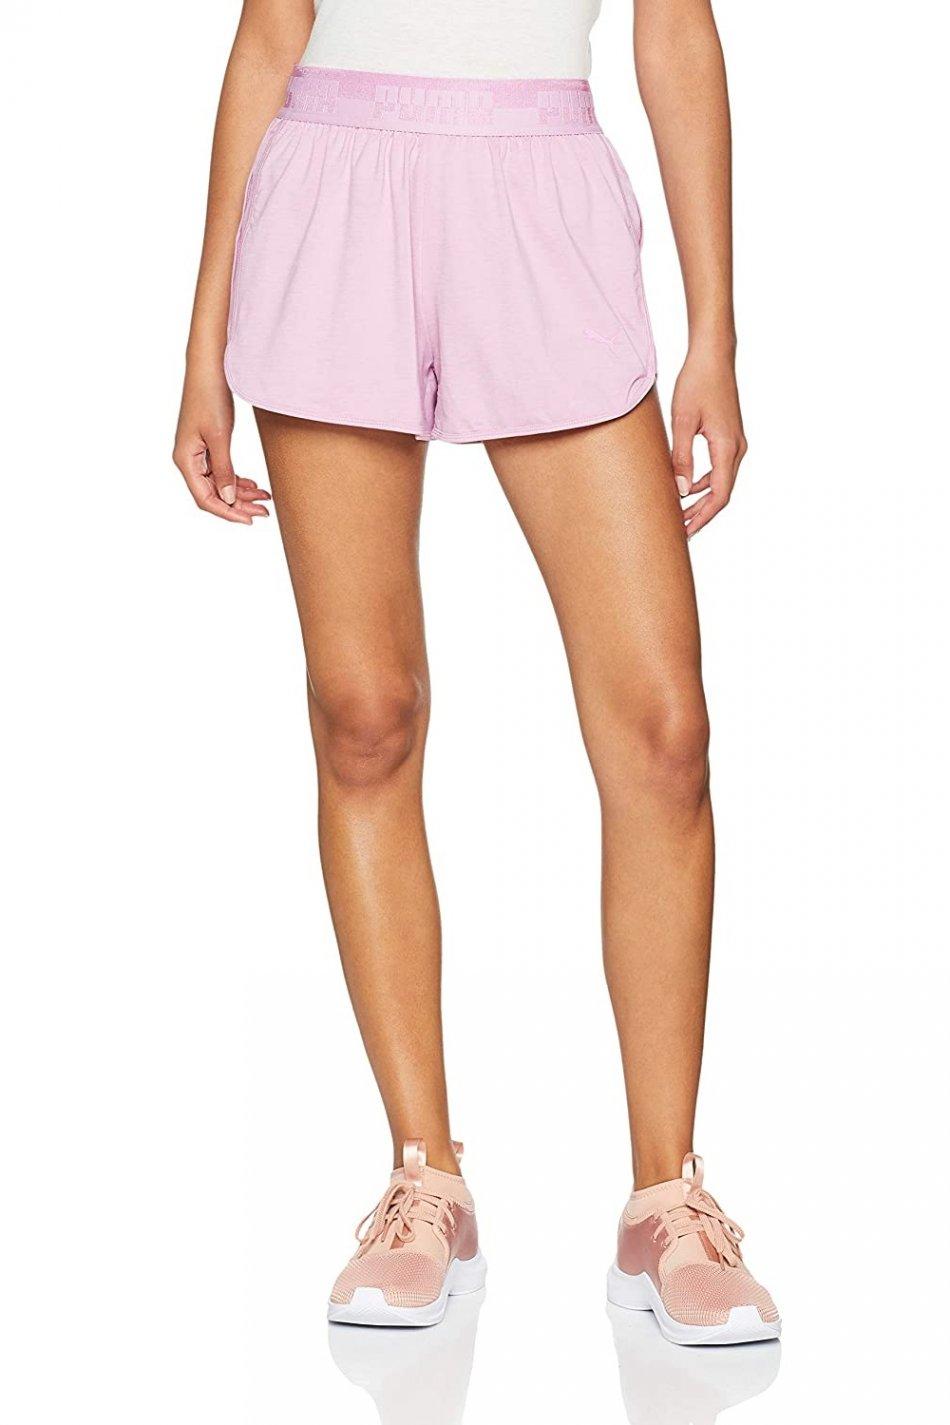 Pantaloni dama, Puma, Mov, XL EU